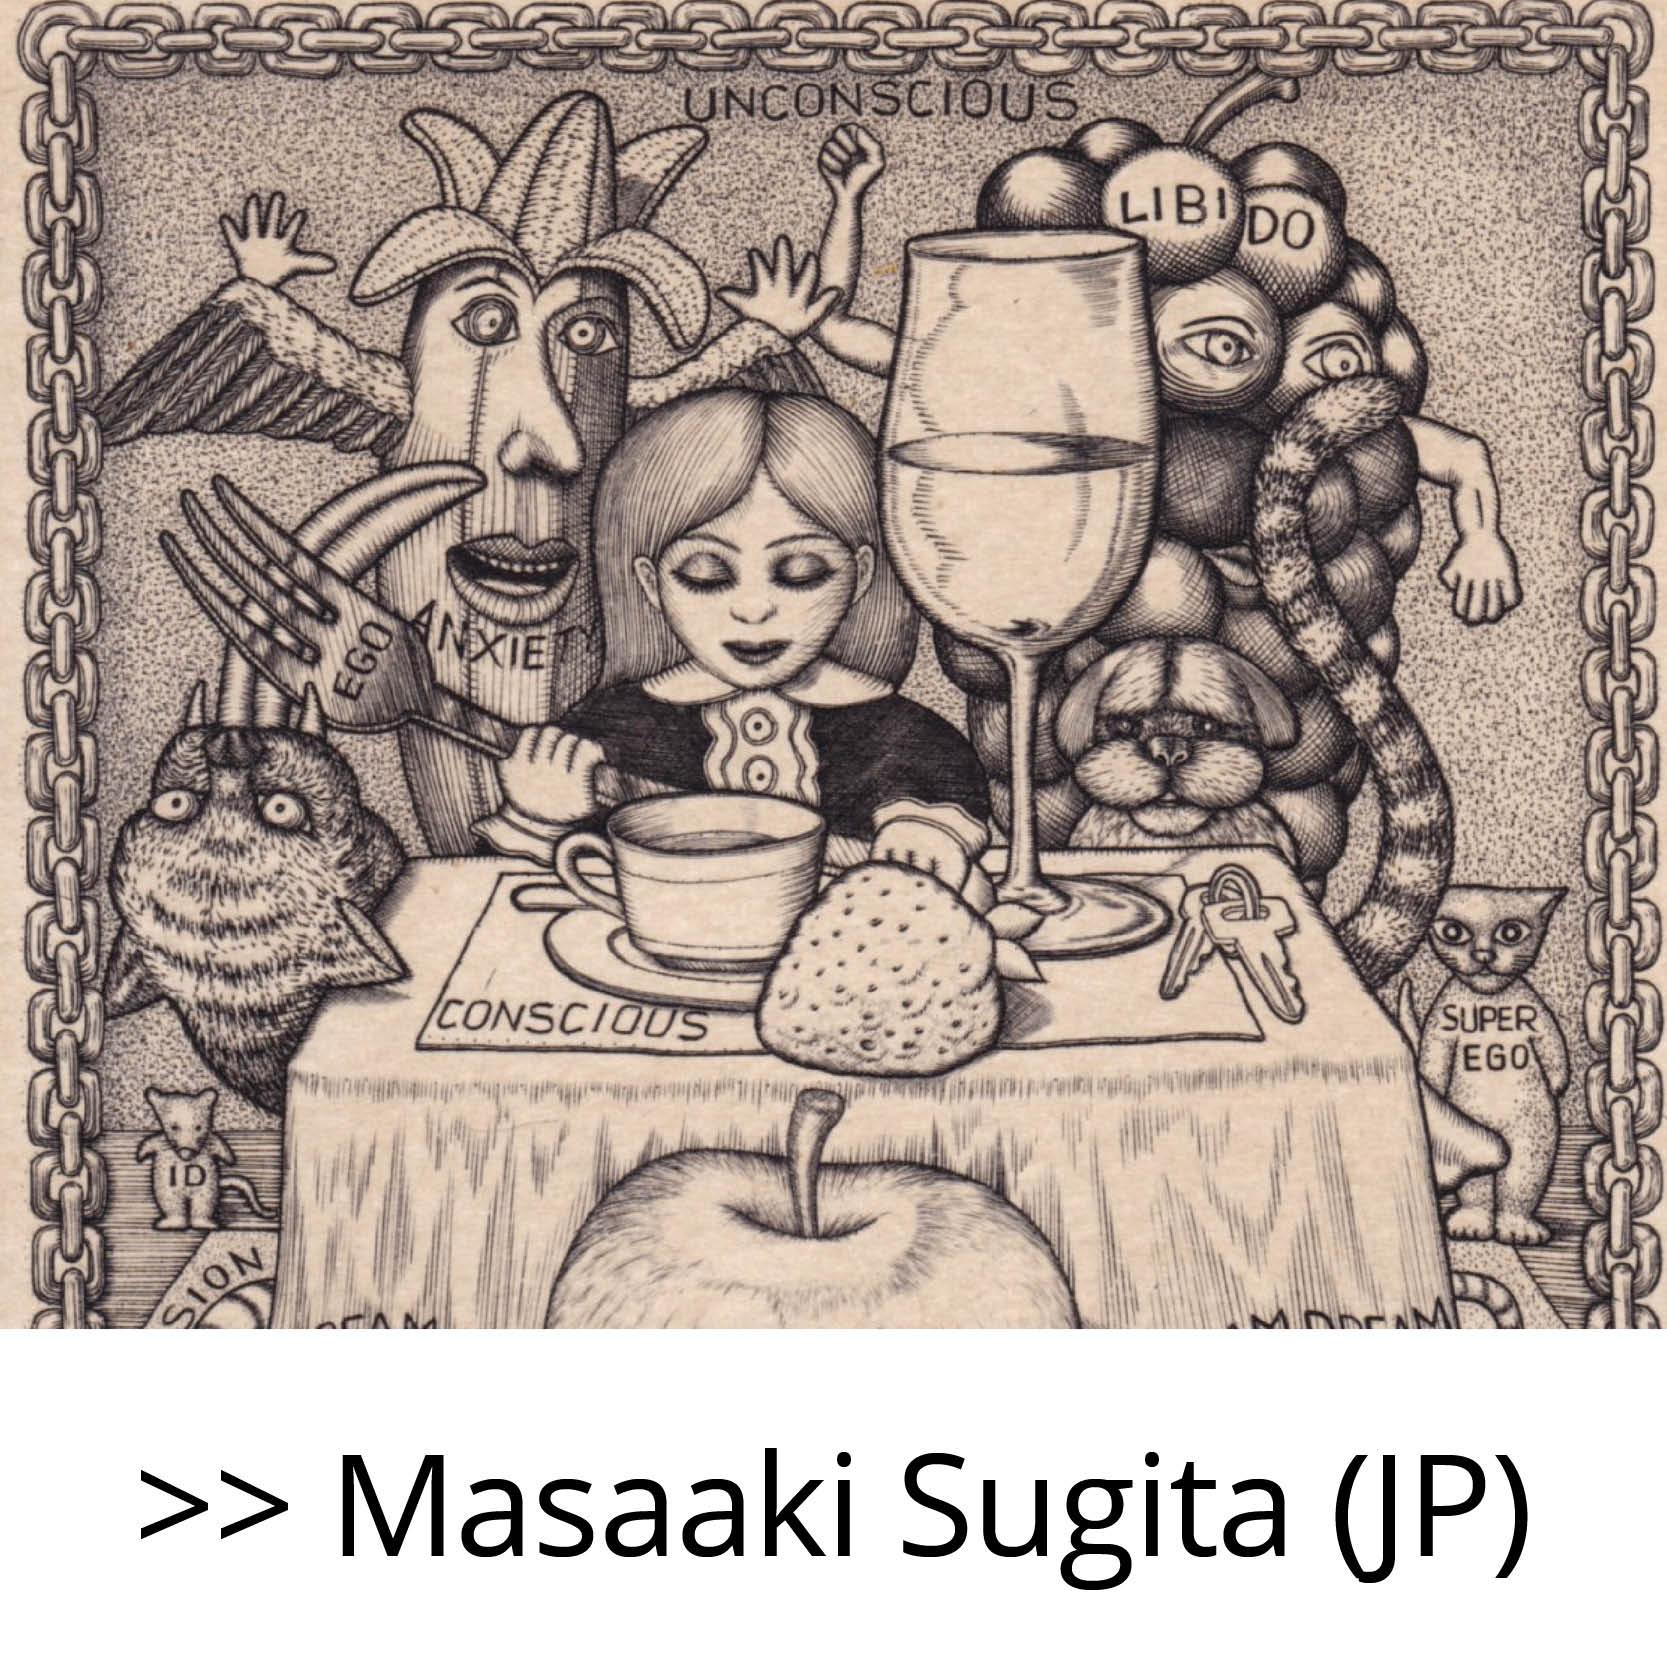 Masaaki_Sugita_(JP)